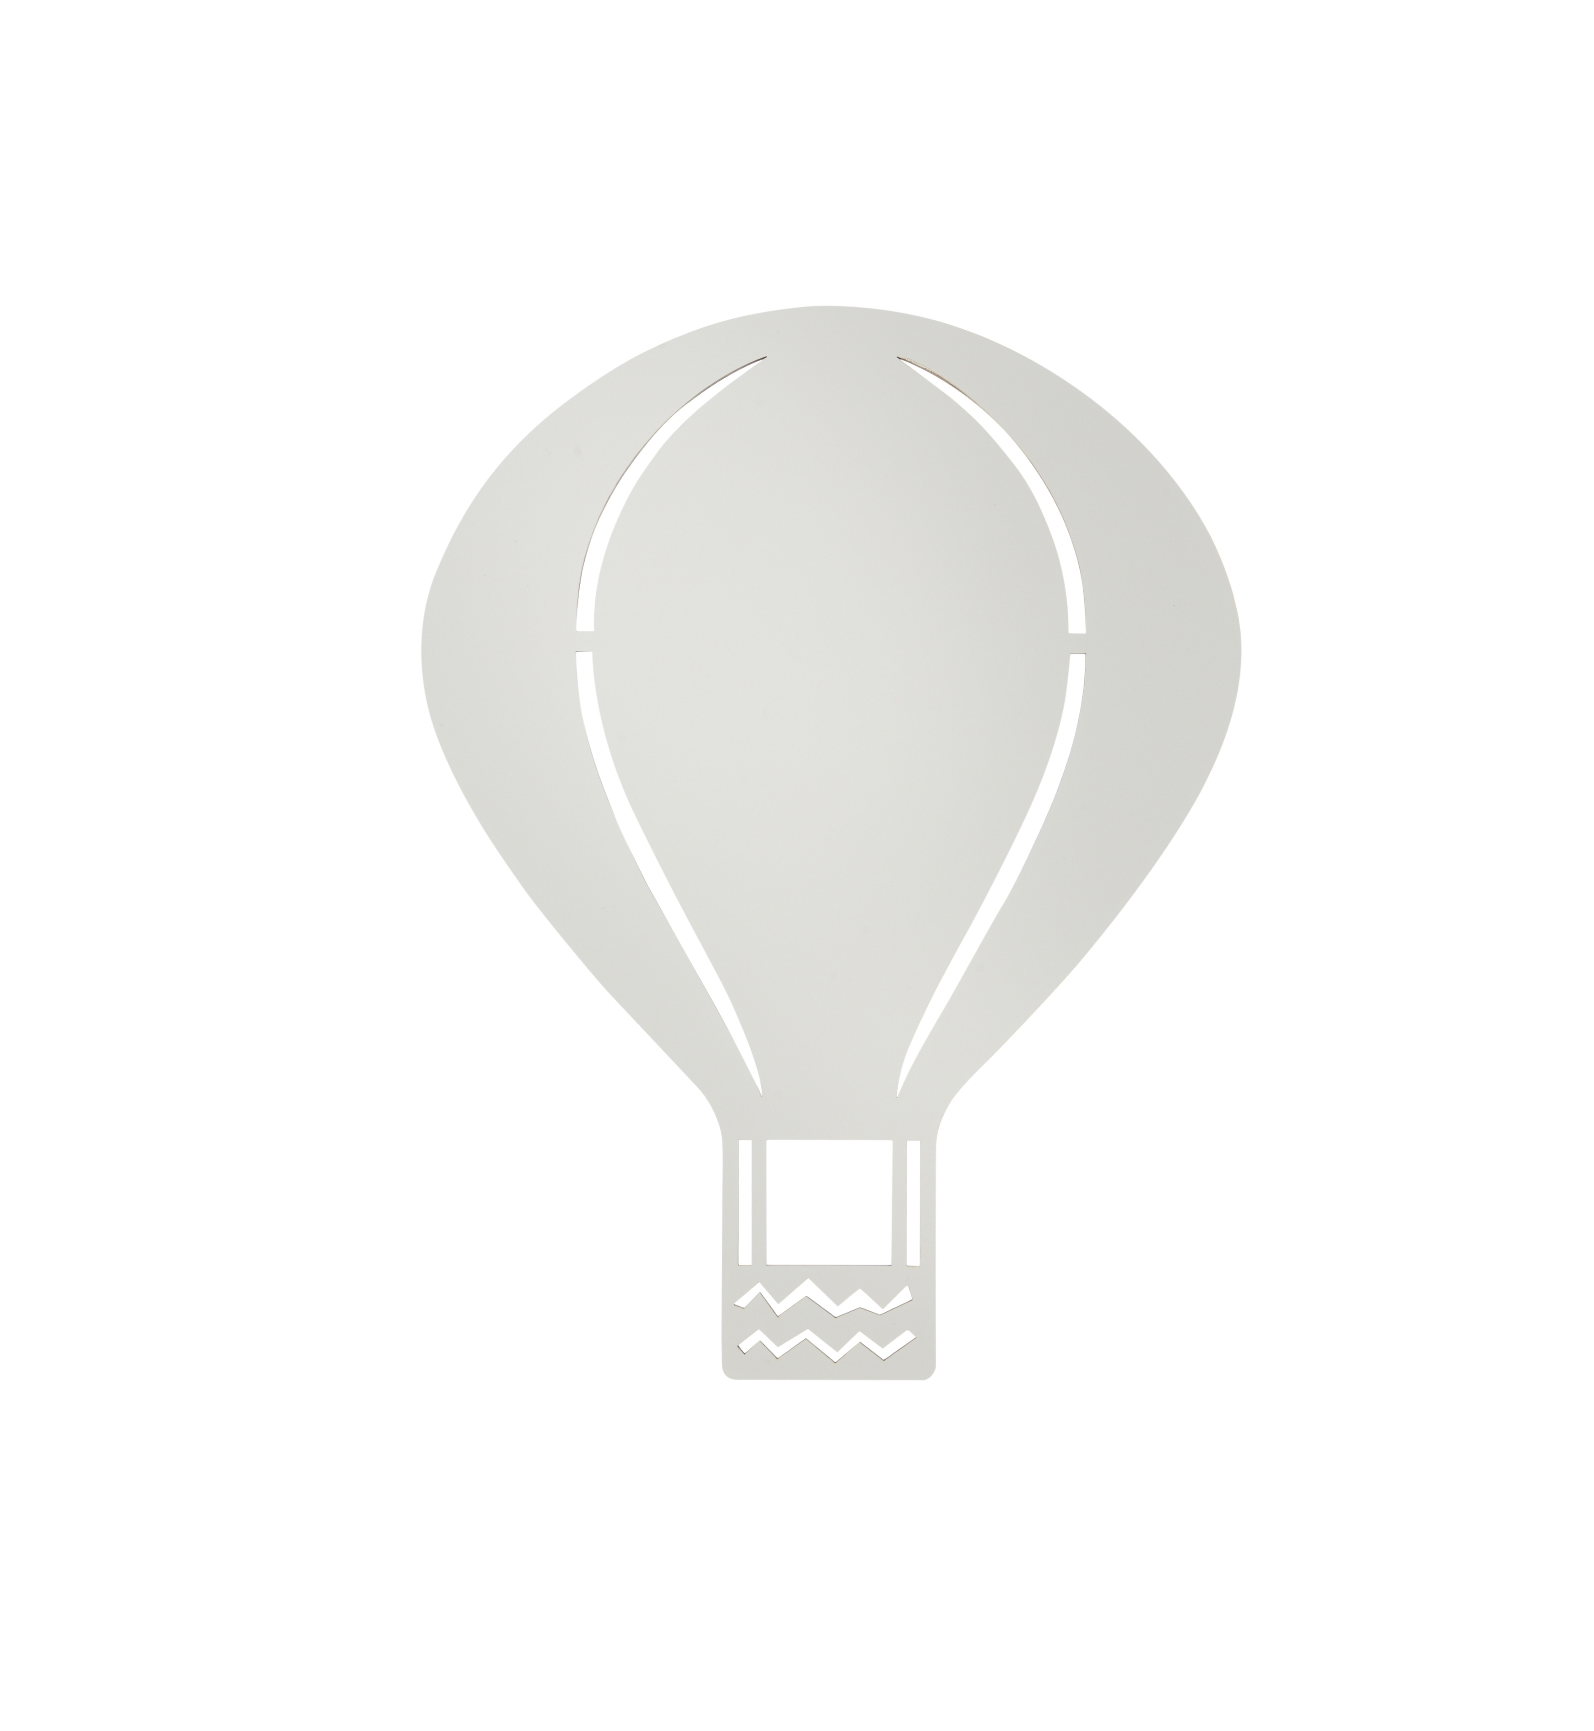 Barnlampa Air Balloon grey, Ferm living